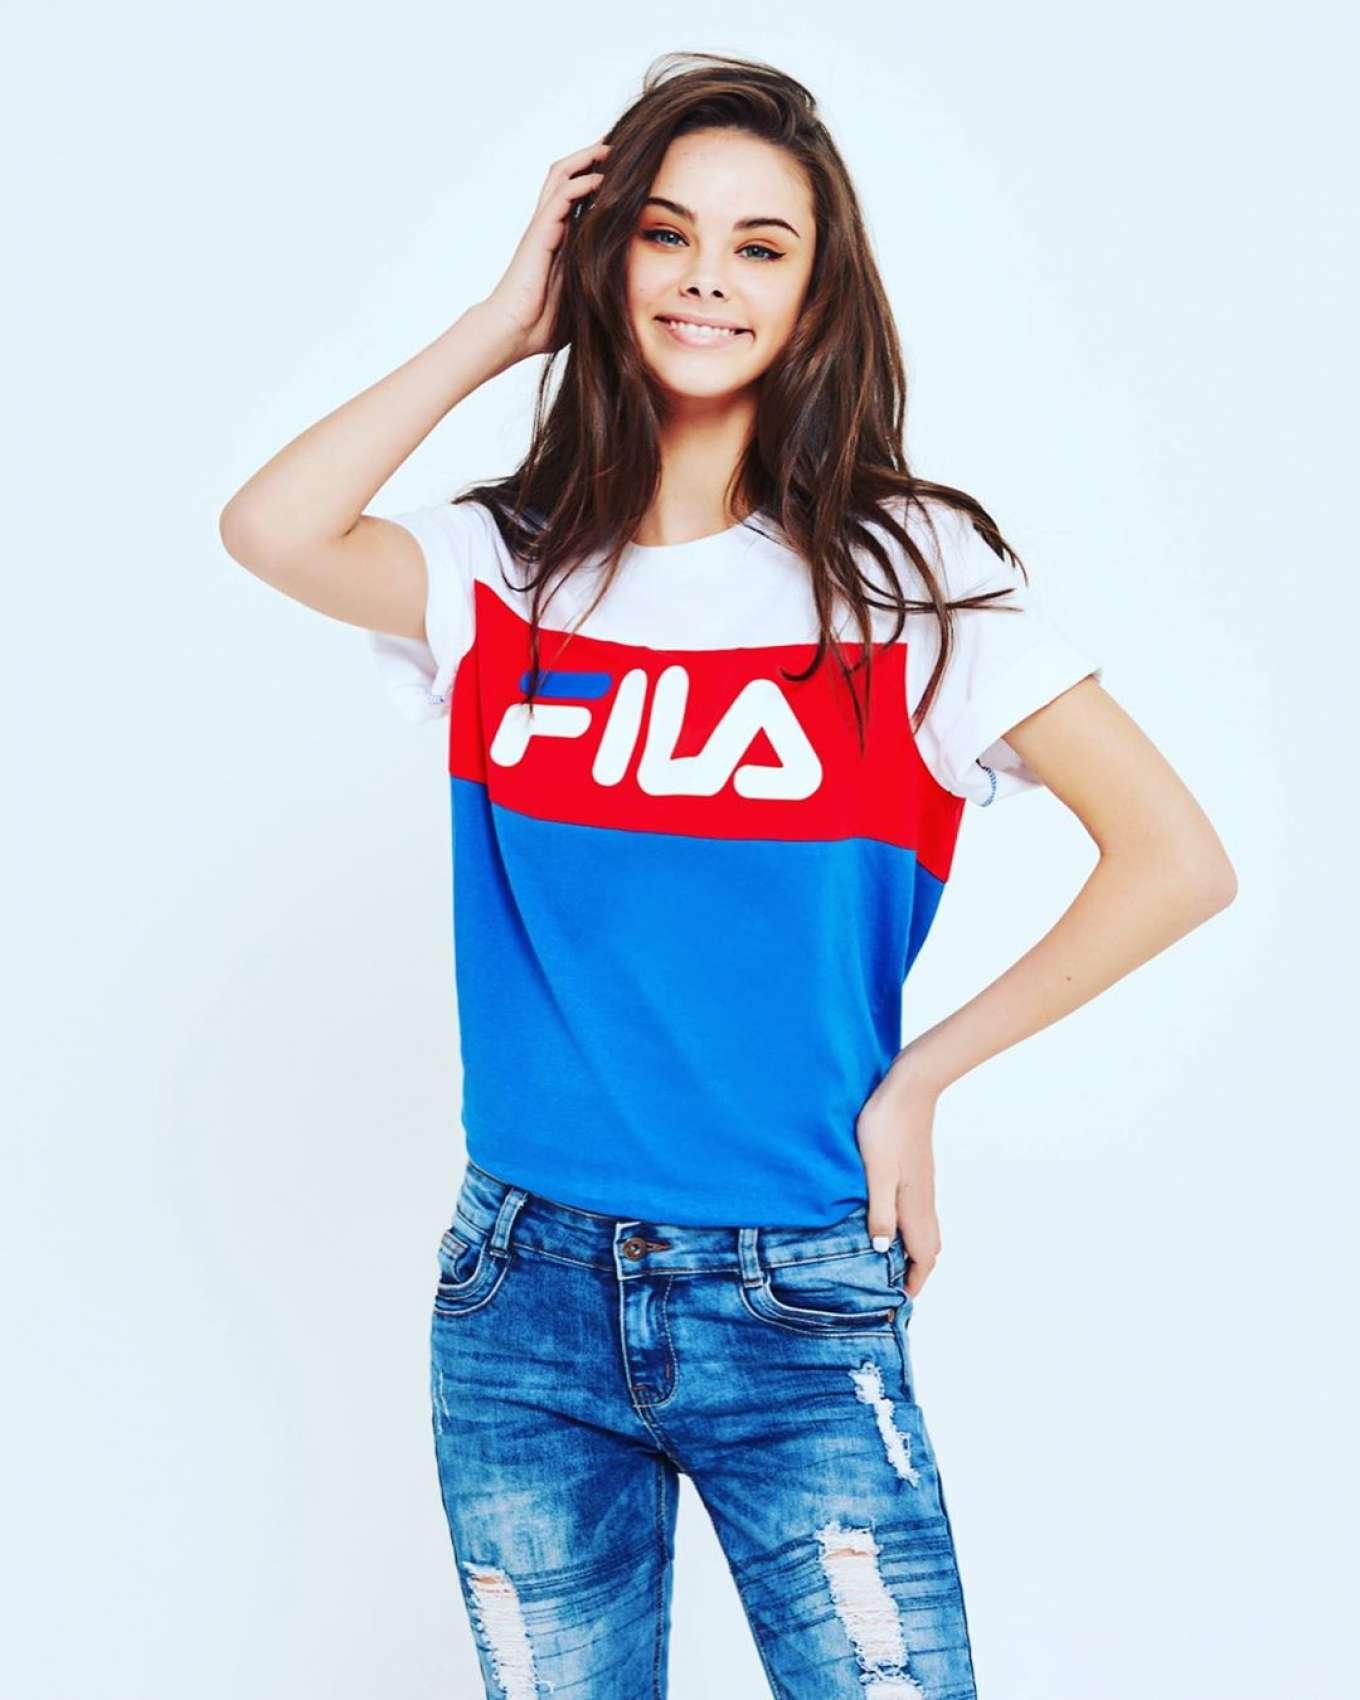 Meika Woollard - Fila Australia Campaign (November 2019)